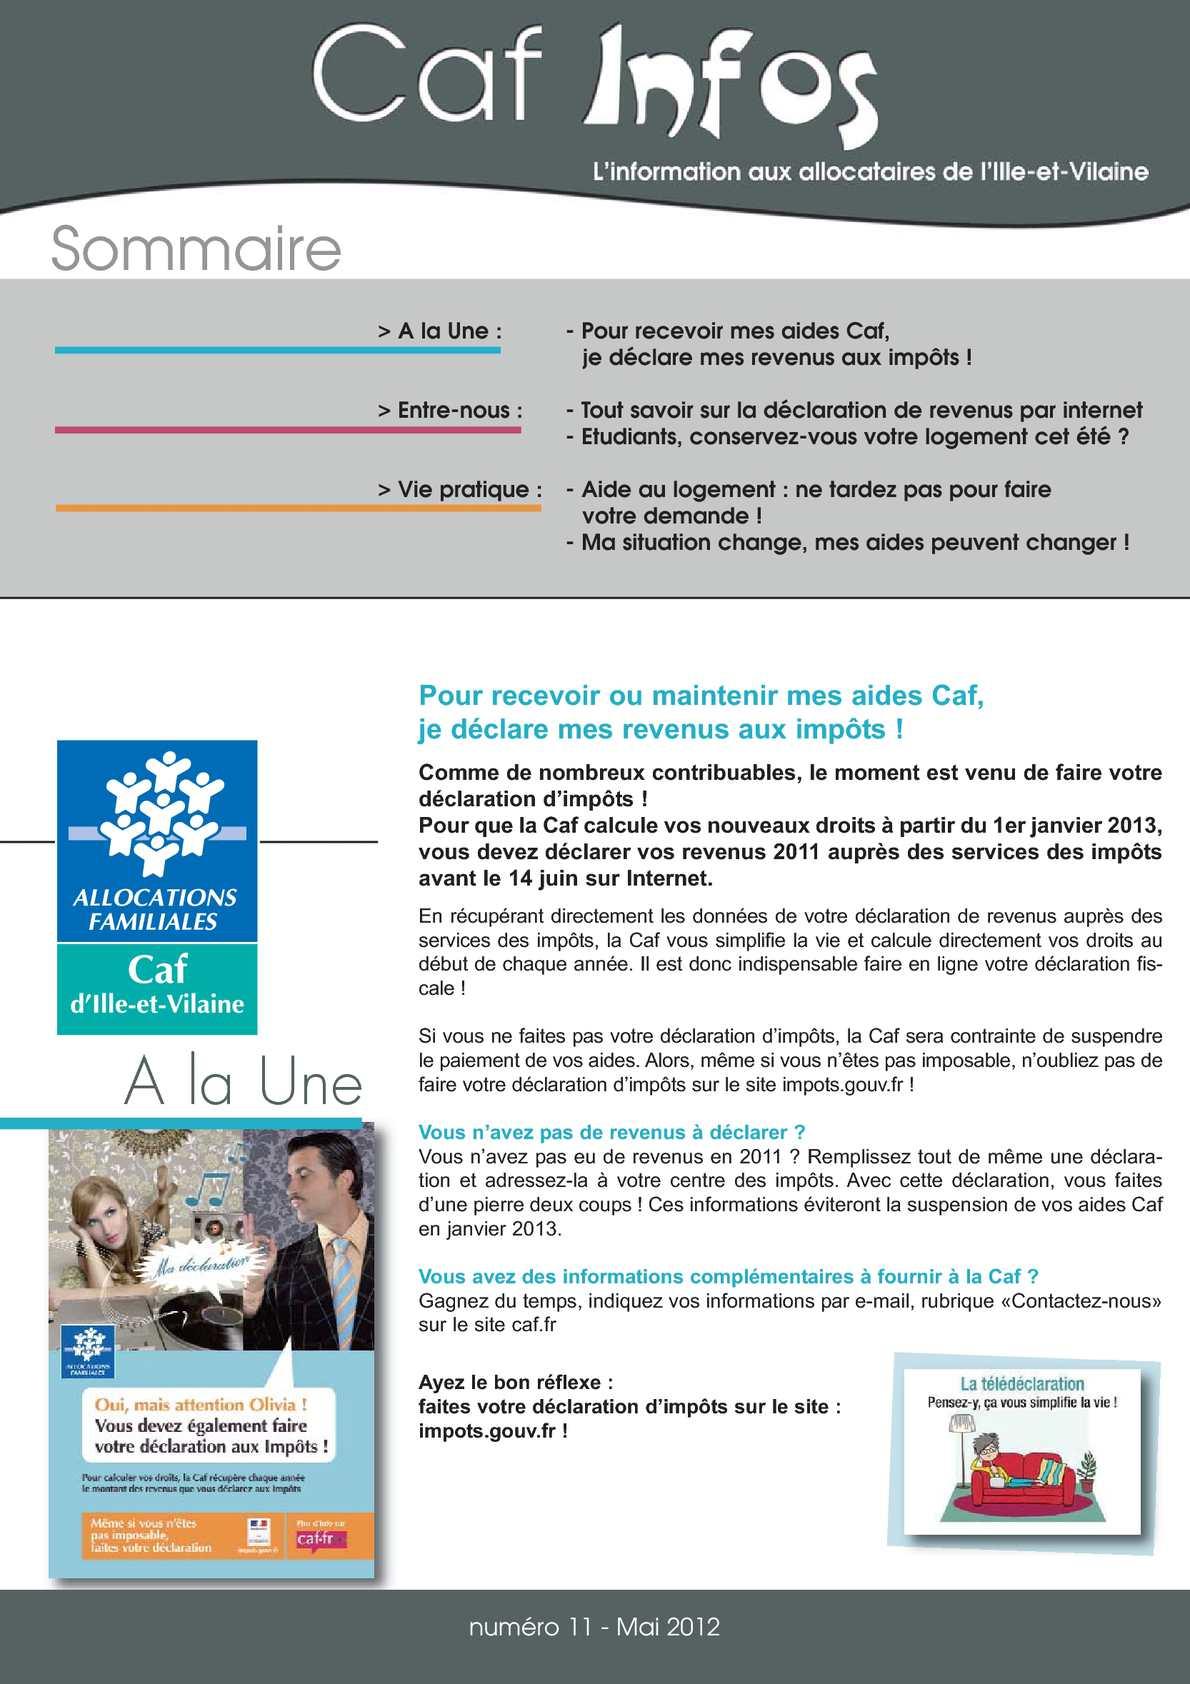 Calameo Journal Cafinfos 11